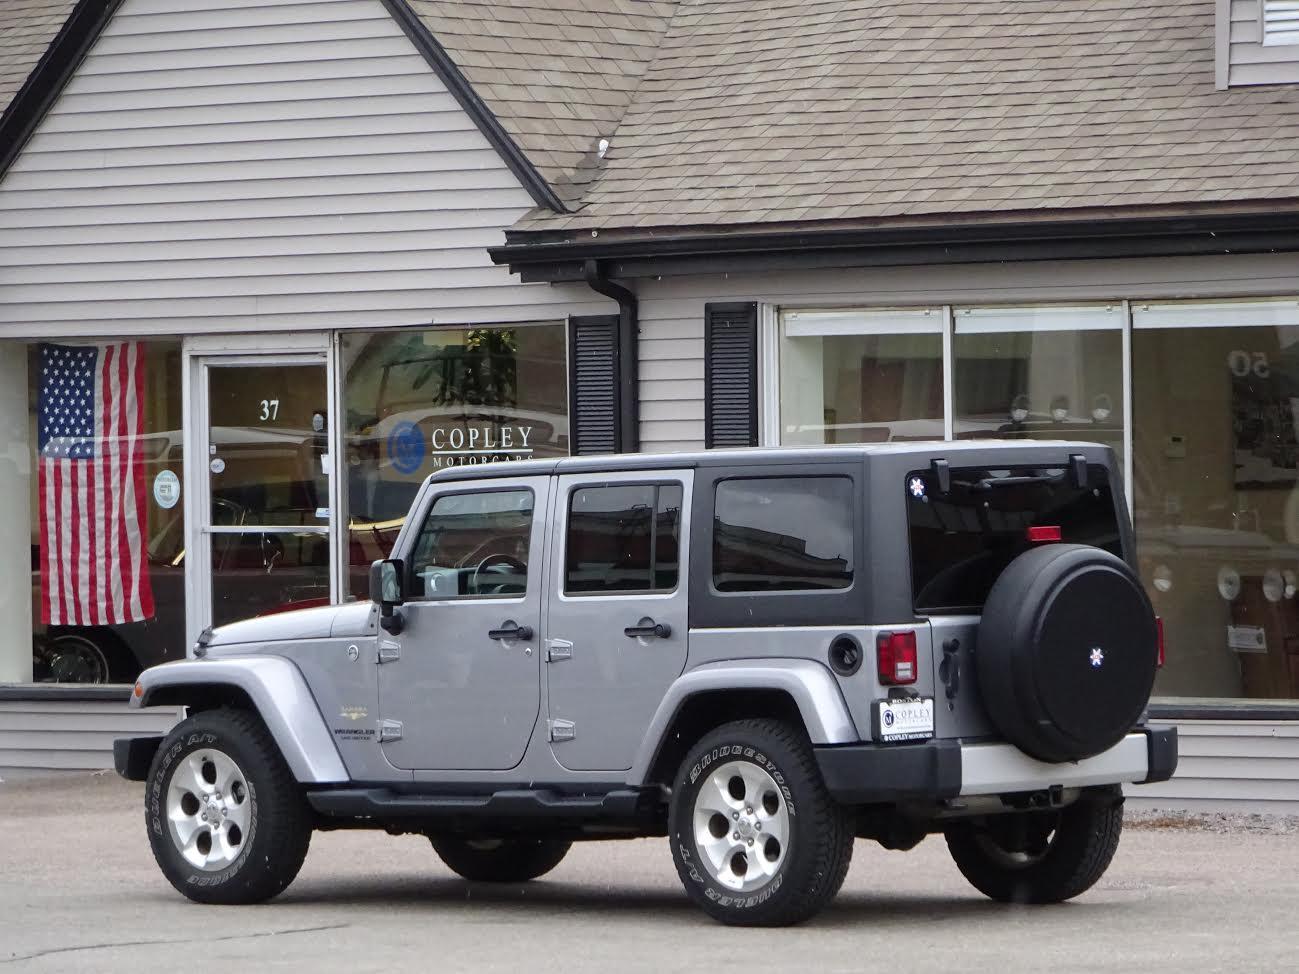 2014 Jeep Wrangler Unlimited Sahara Copley Motorcars